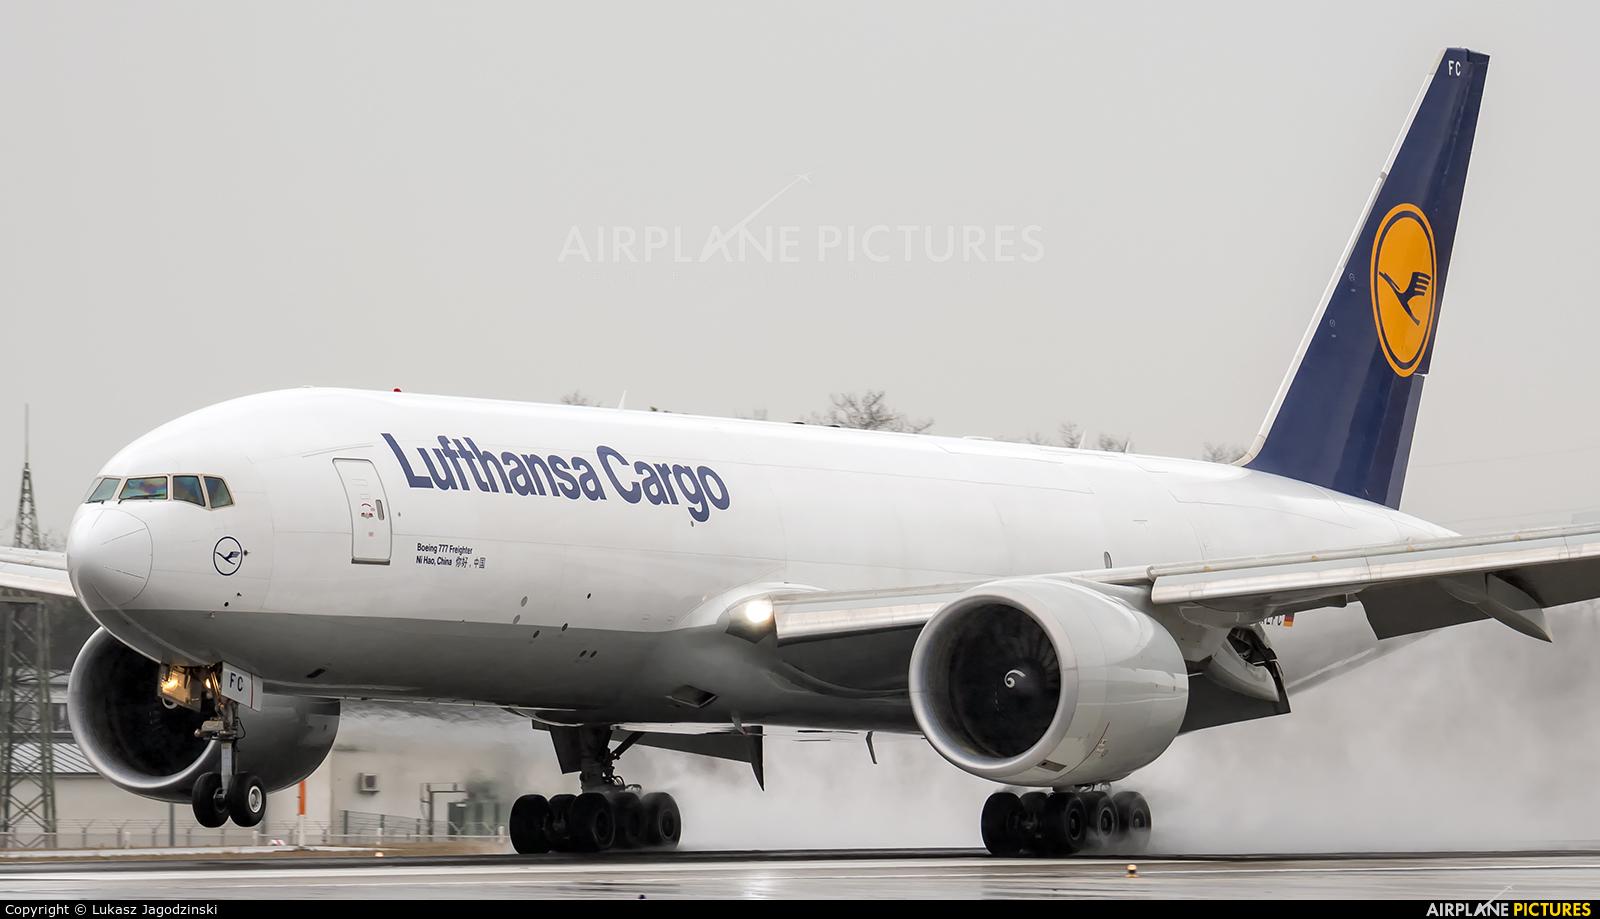 Lufthansa Cargo D-ALFC aircraft at Warsaw - Frederic Chopin